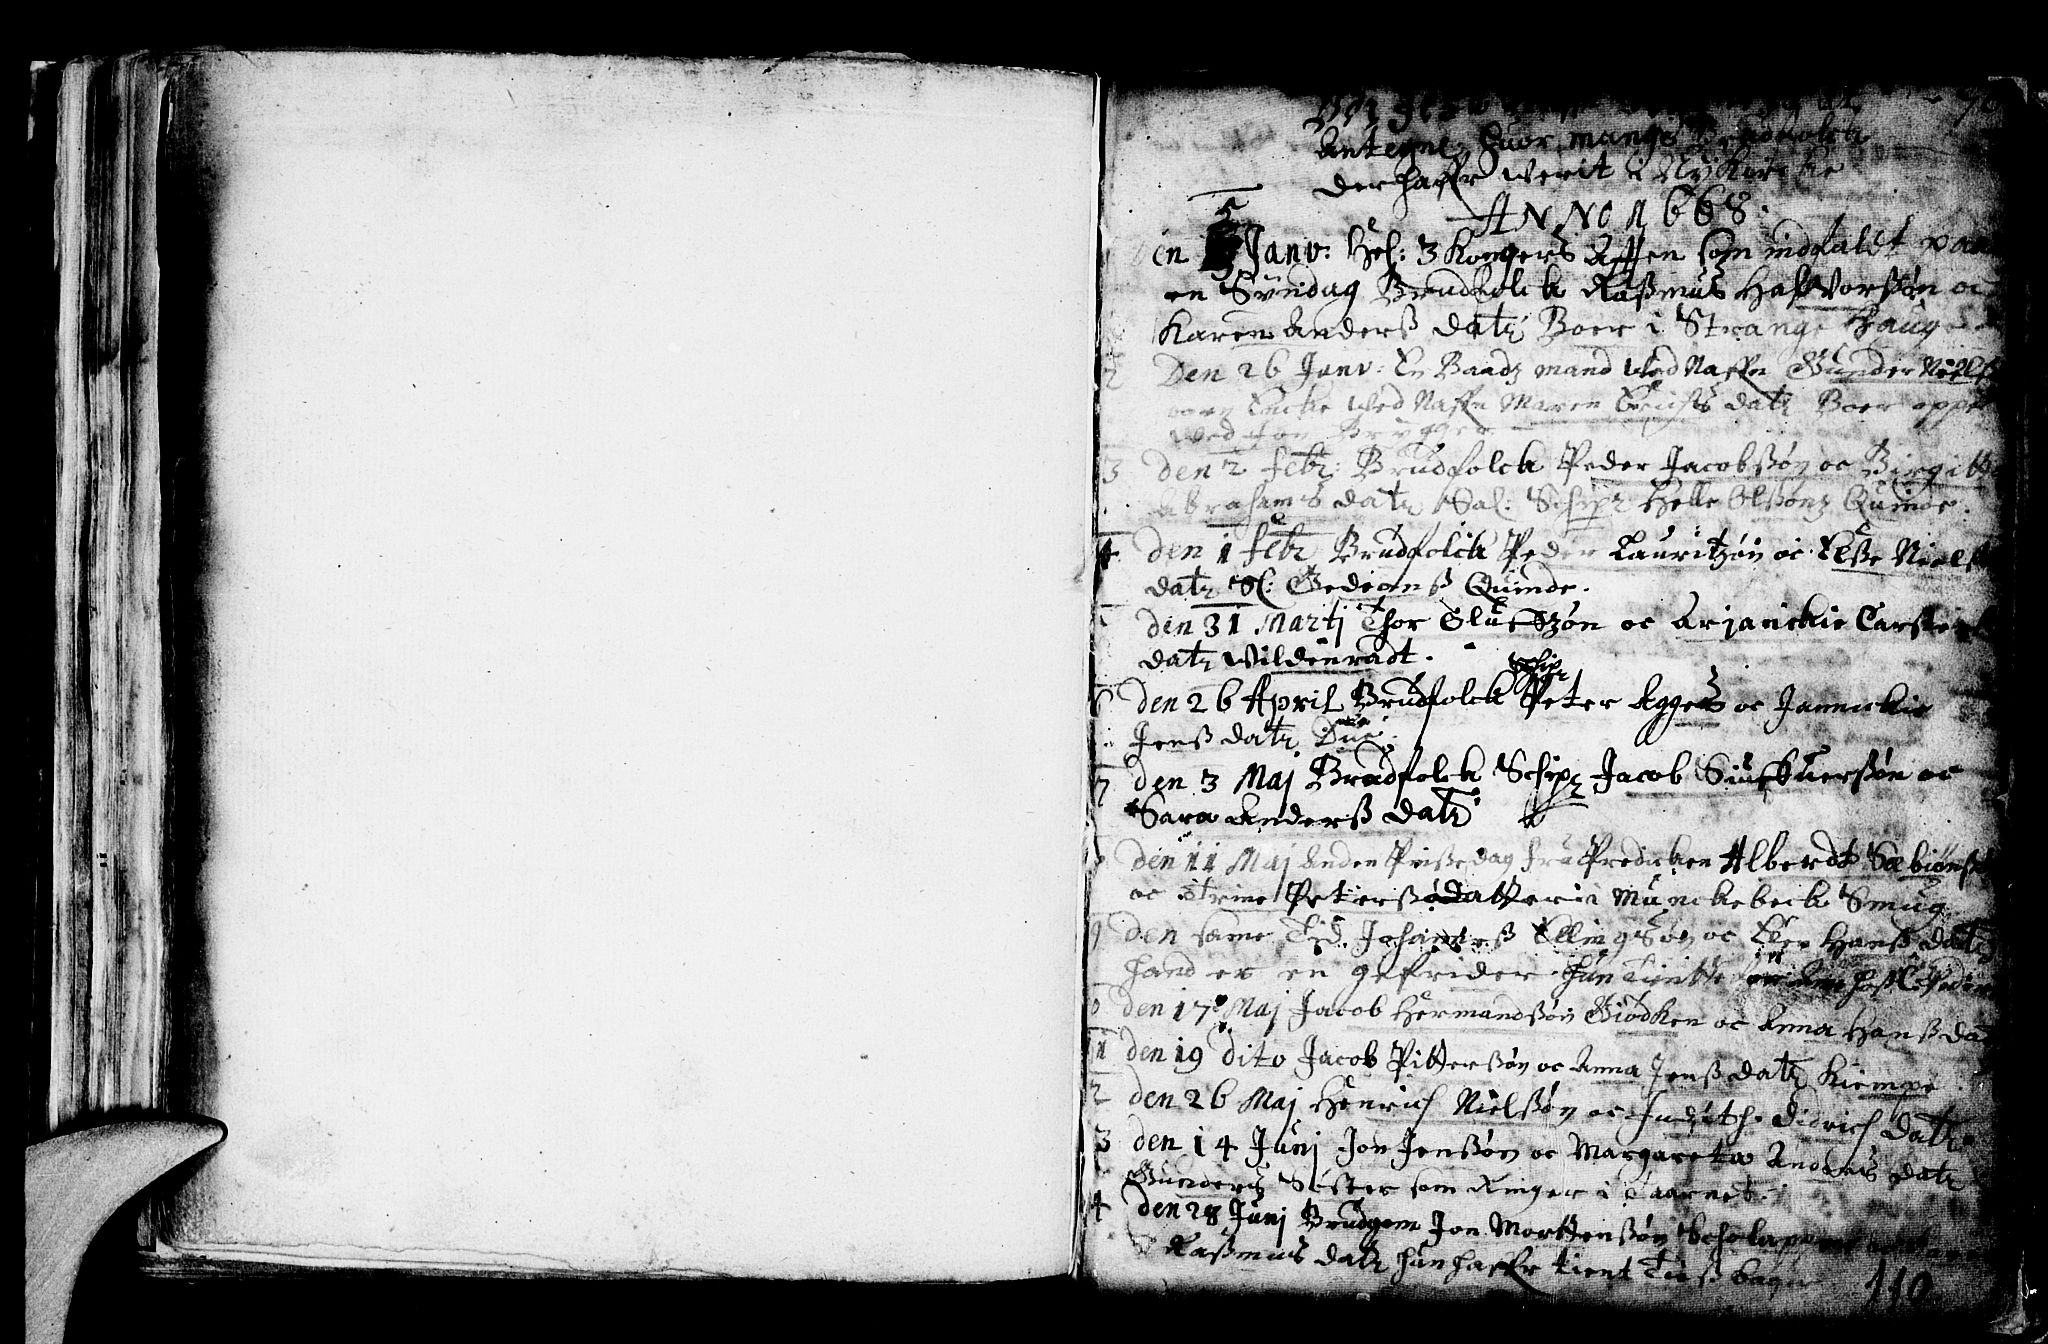 SAB, Nykirken Sokneprestembete, H/Haa: Ministerialbok nr. A 1, 1668-1820, s. 110